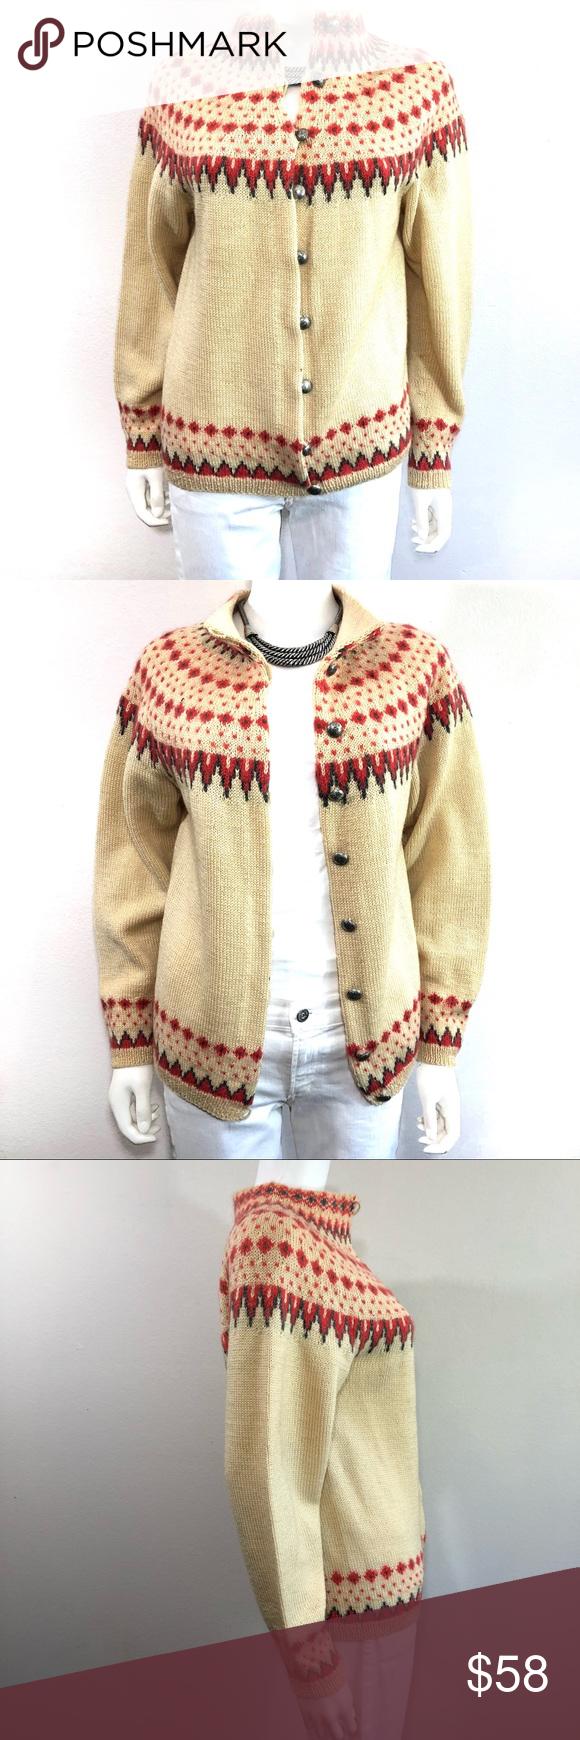 6f26432f114cc6 Vintage Handmade Norway Wool Fair Isle Cardigan VINTAGE • William Schmidt  Co Oslo • Wool Norwegian Classic Fair Isle Cardigan Sweater Women s Size  Medium ...